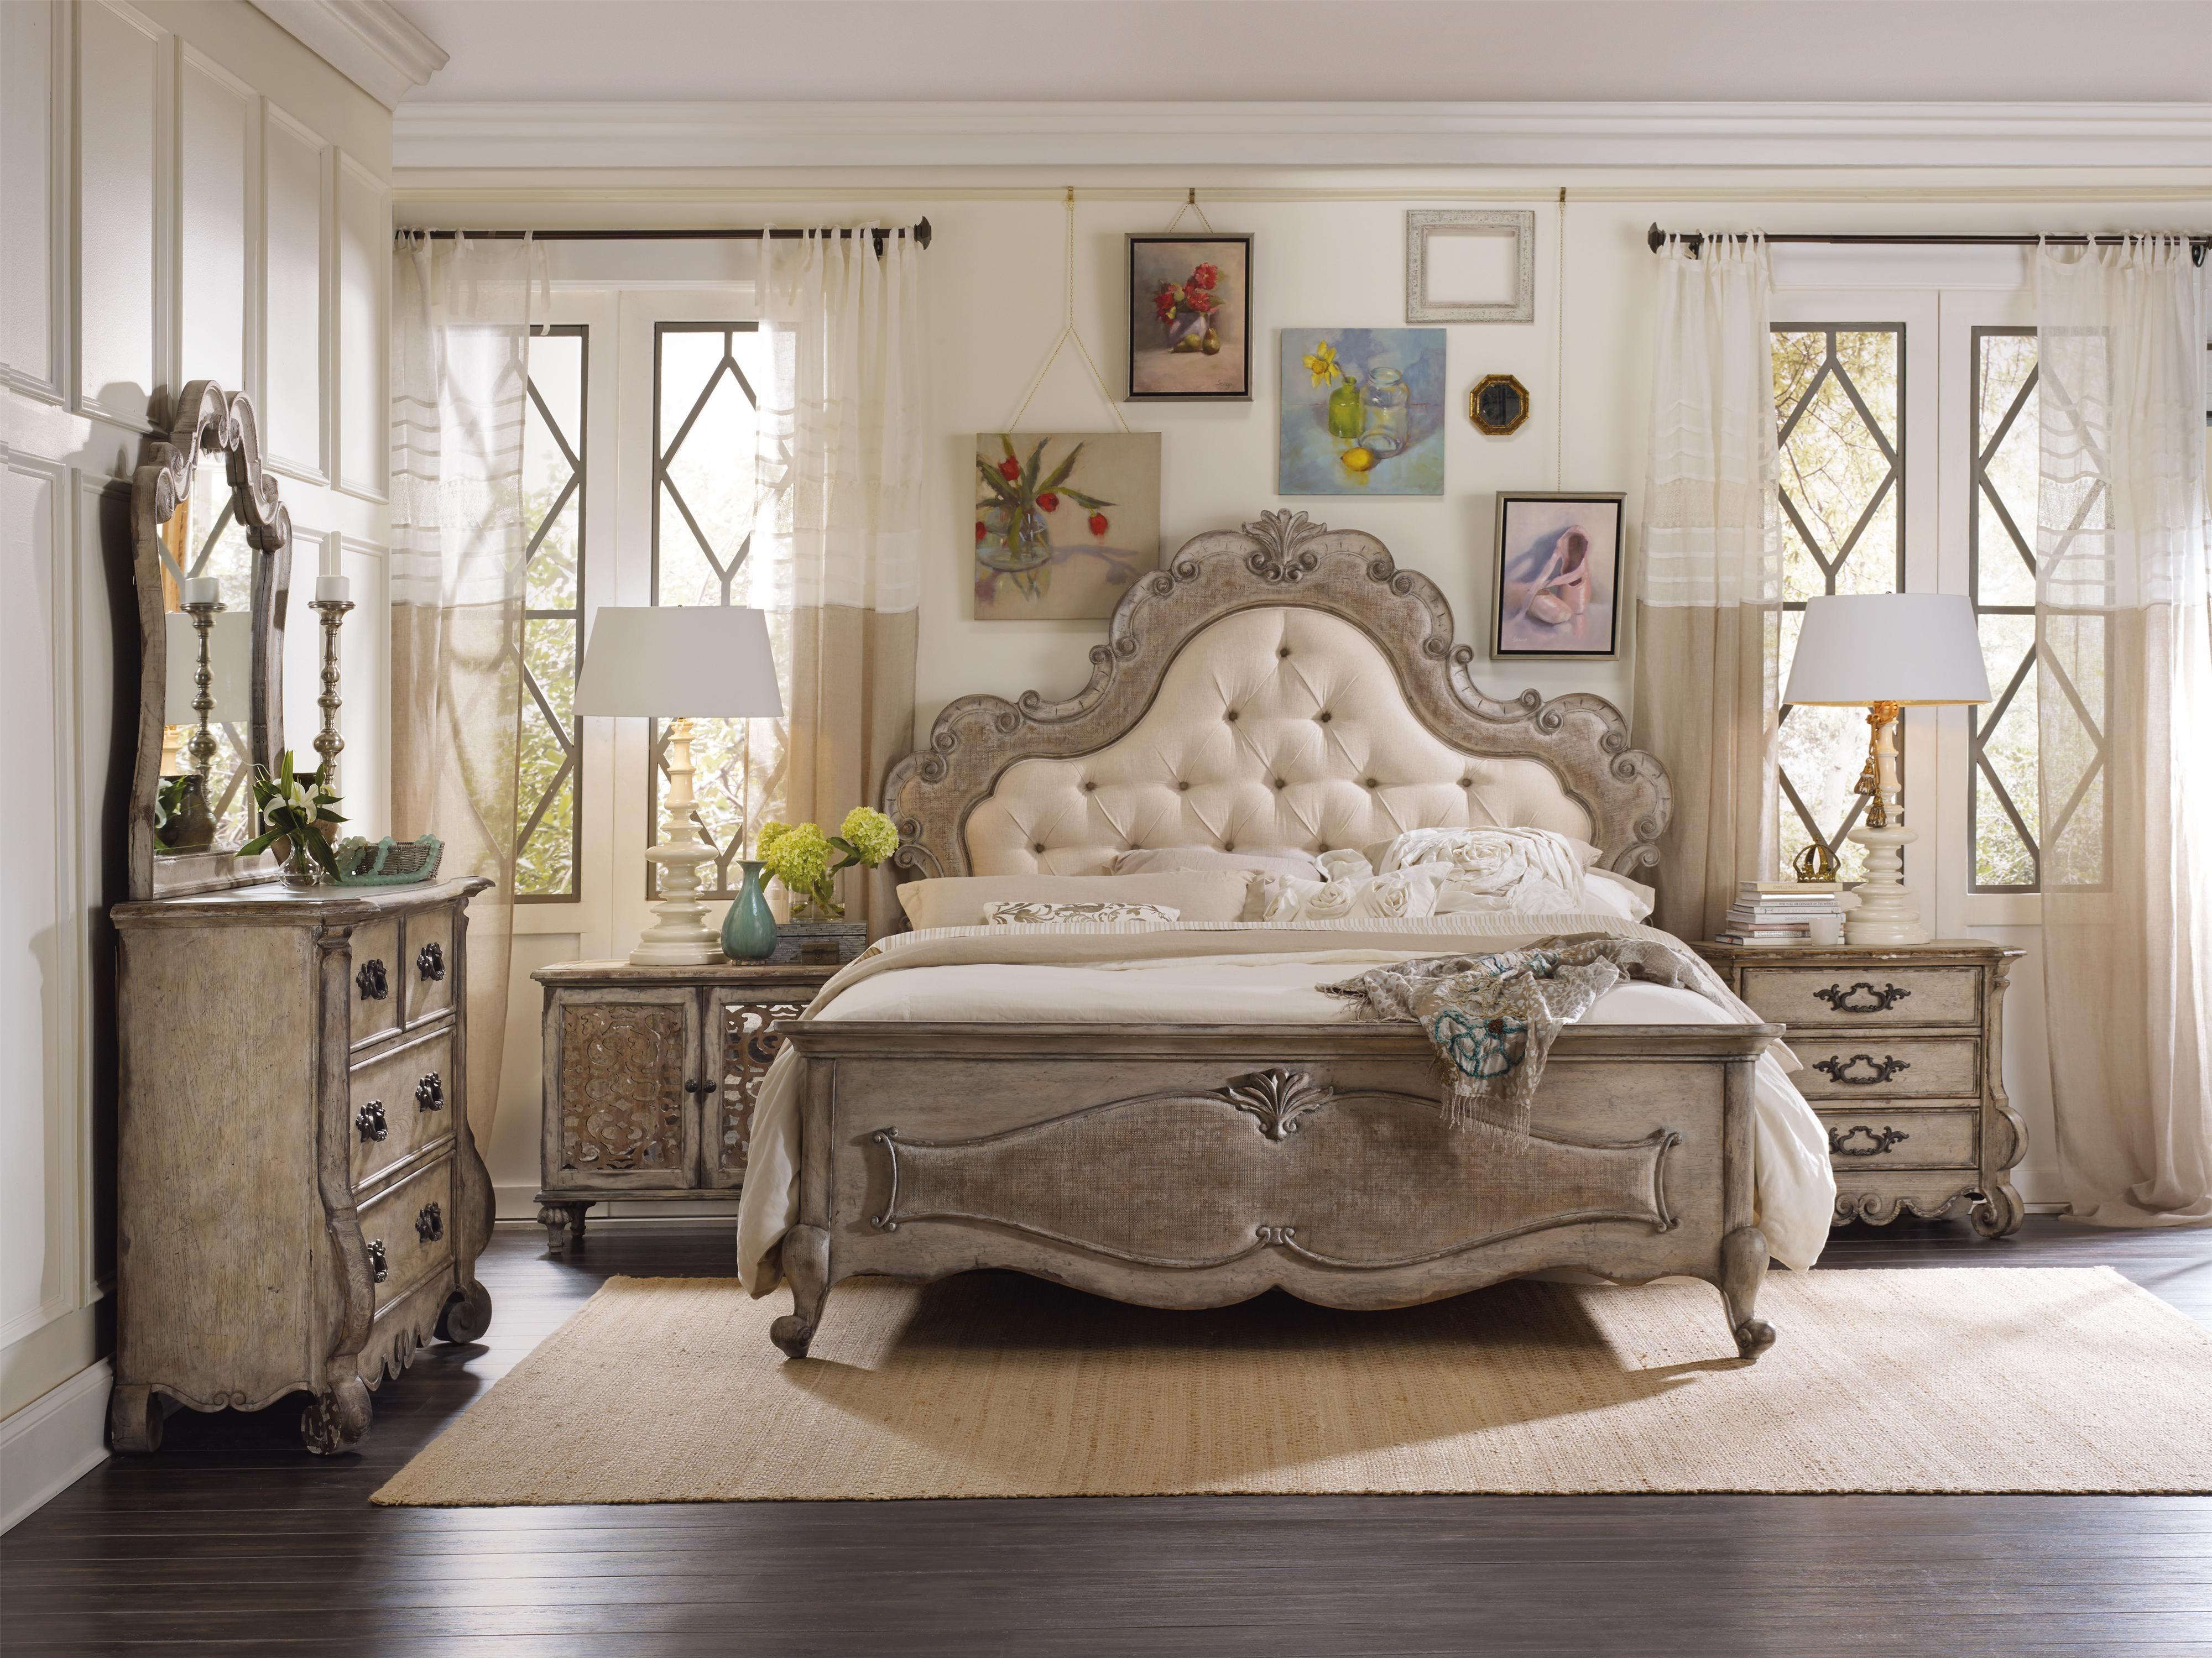 Charmant Lagniappe Home Store | Mobile, Daphne, Alabama Furniture U0026 Mattress ...